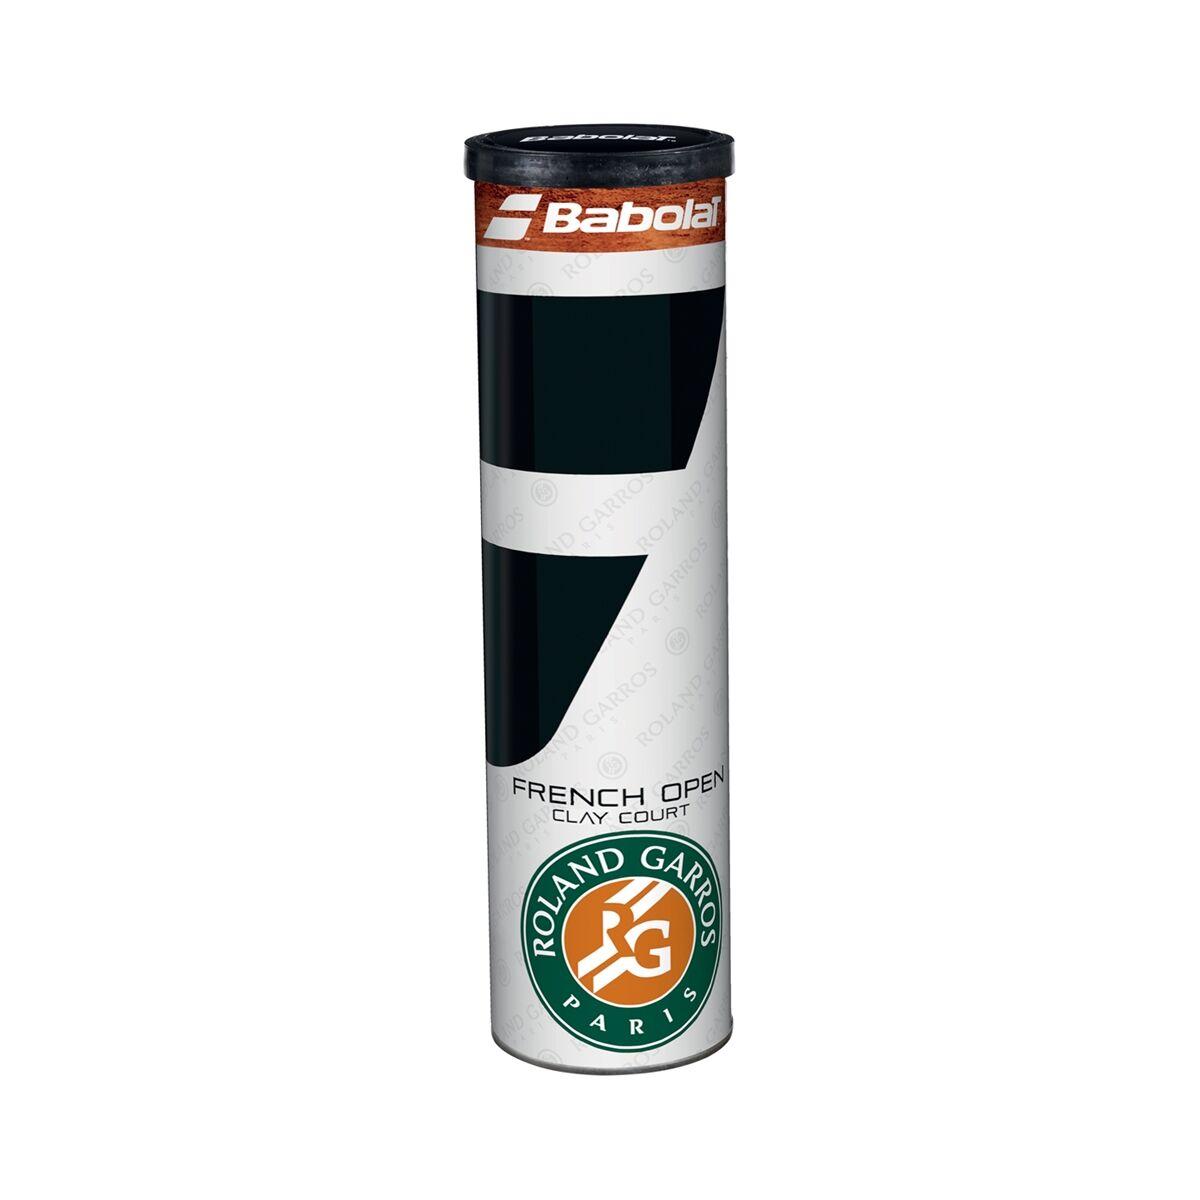 Babolat Roland Garros Clay Court 12 tuubia